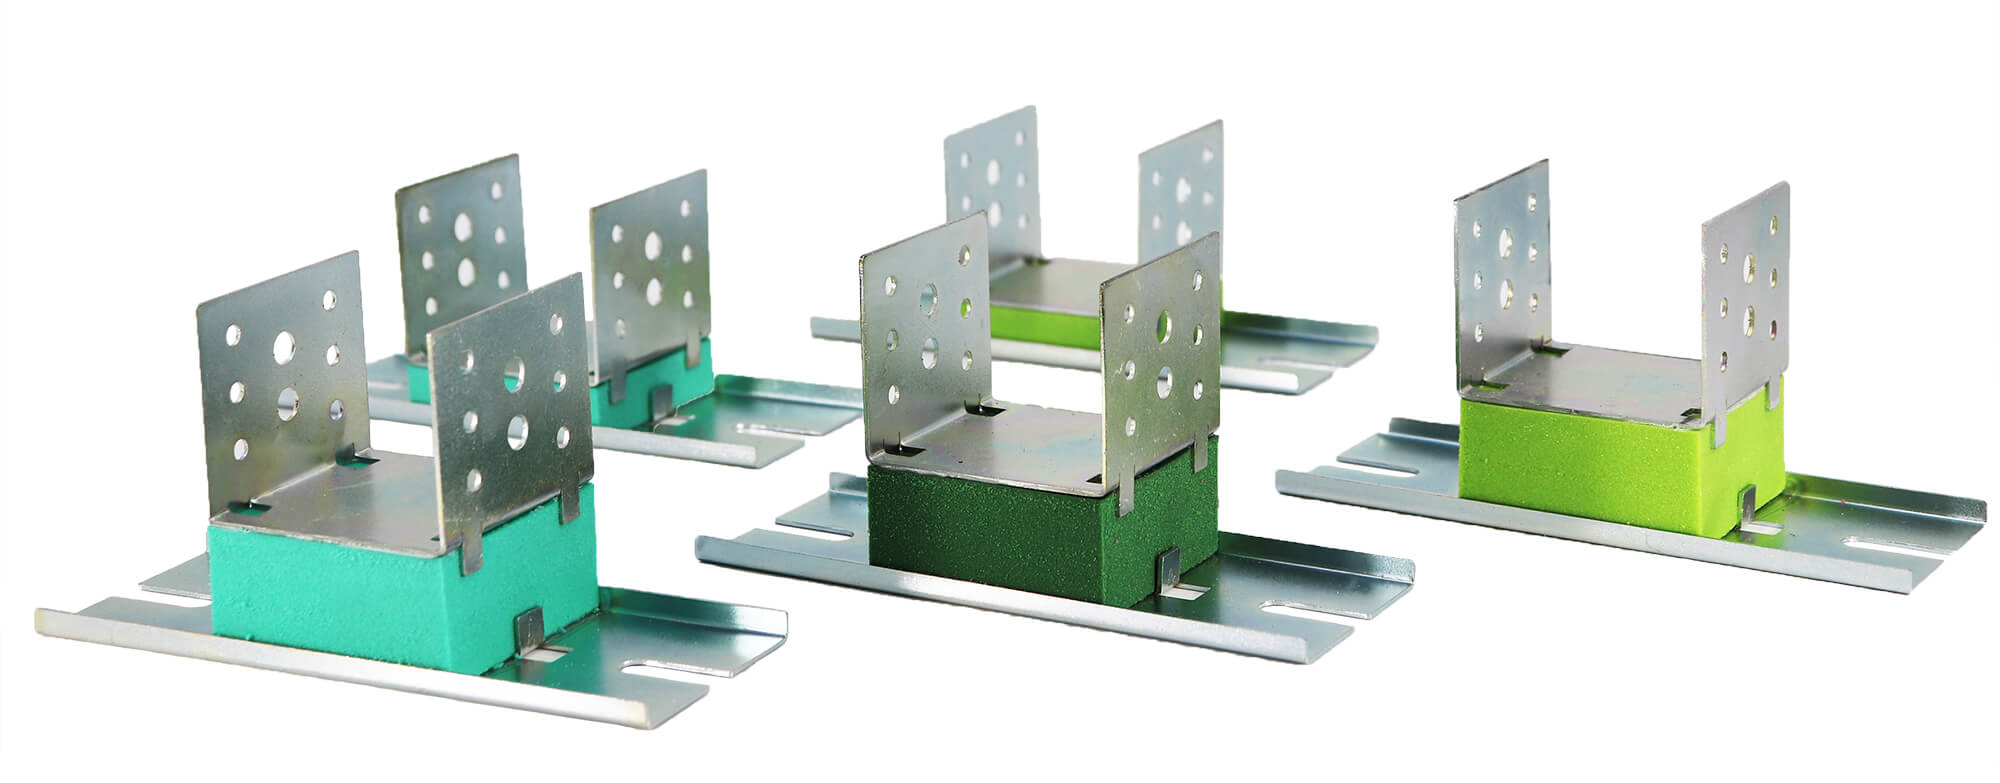 akustik-floor-mount-test-platform-3.jpg